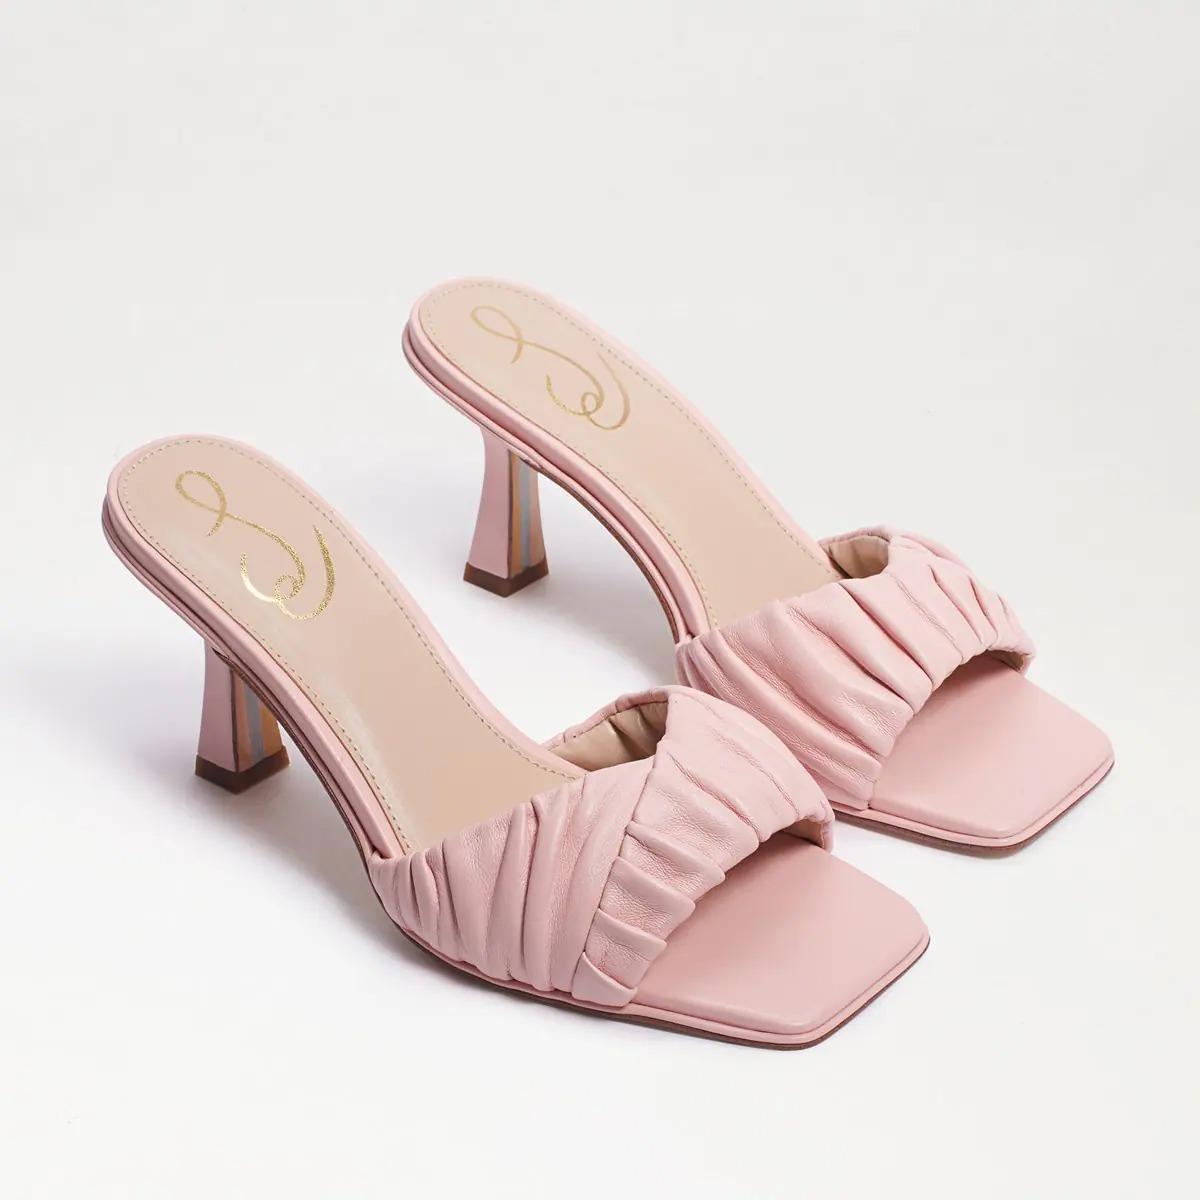 pink leather slide-on Sam Edelman heeled wedding sandals